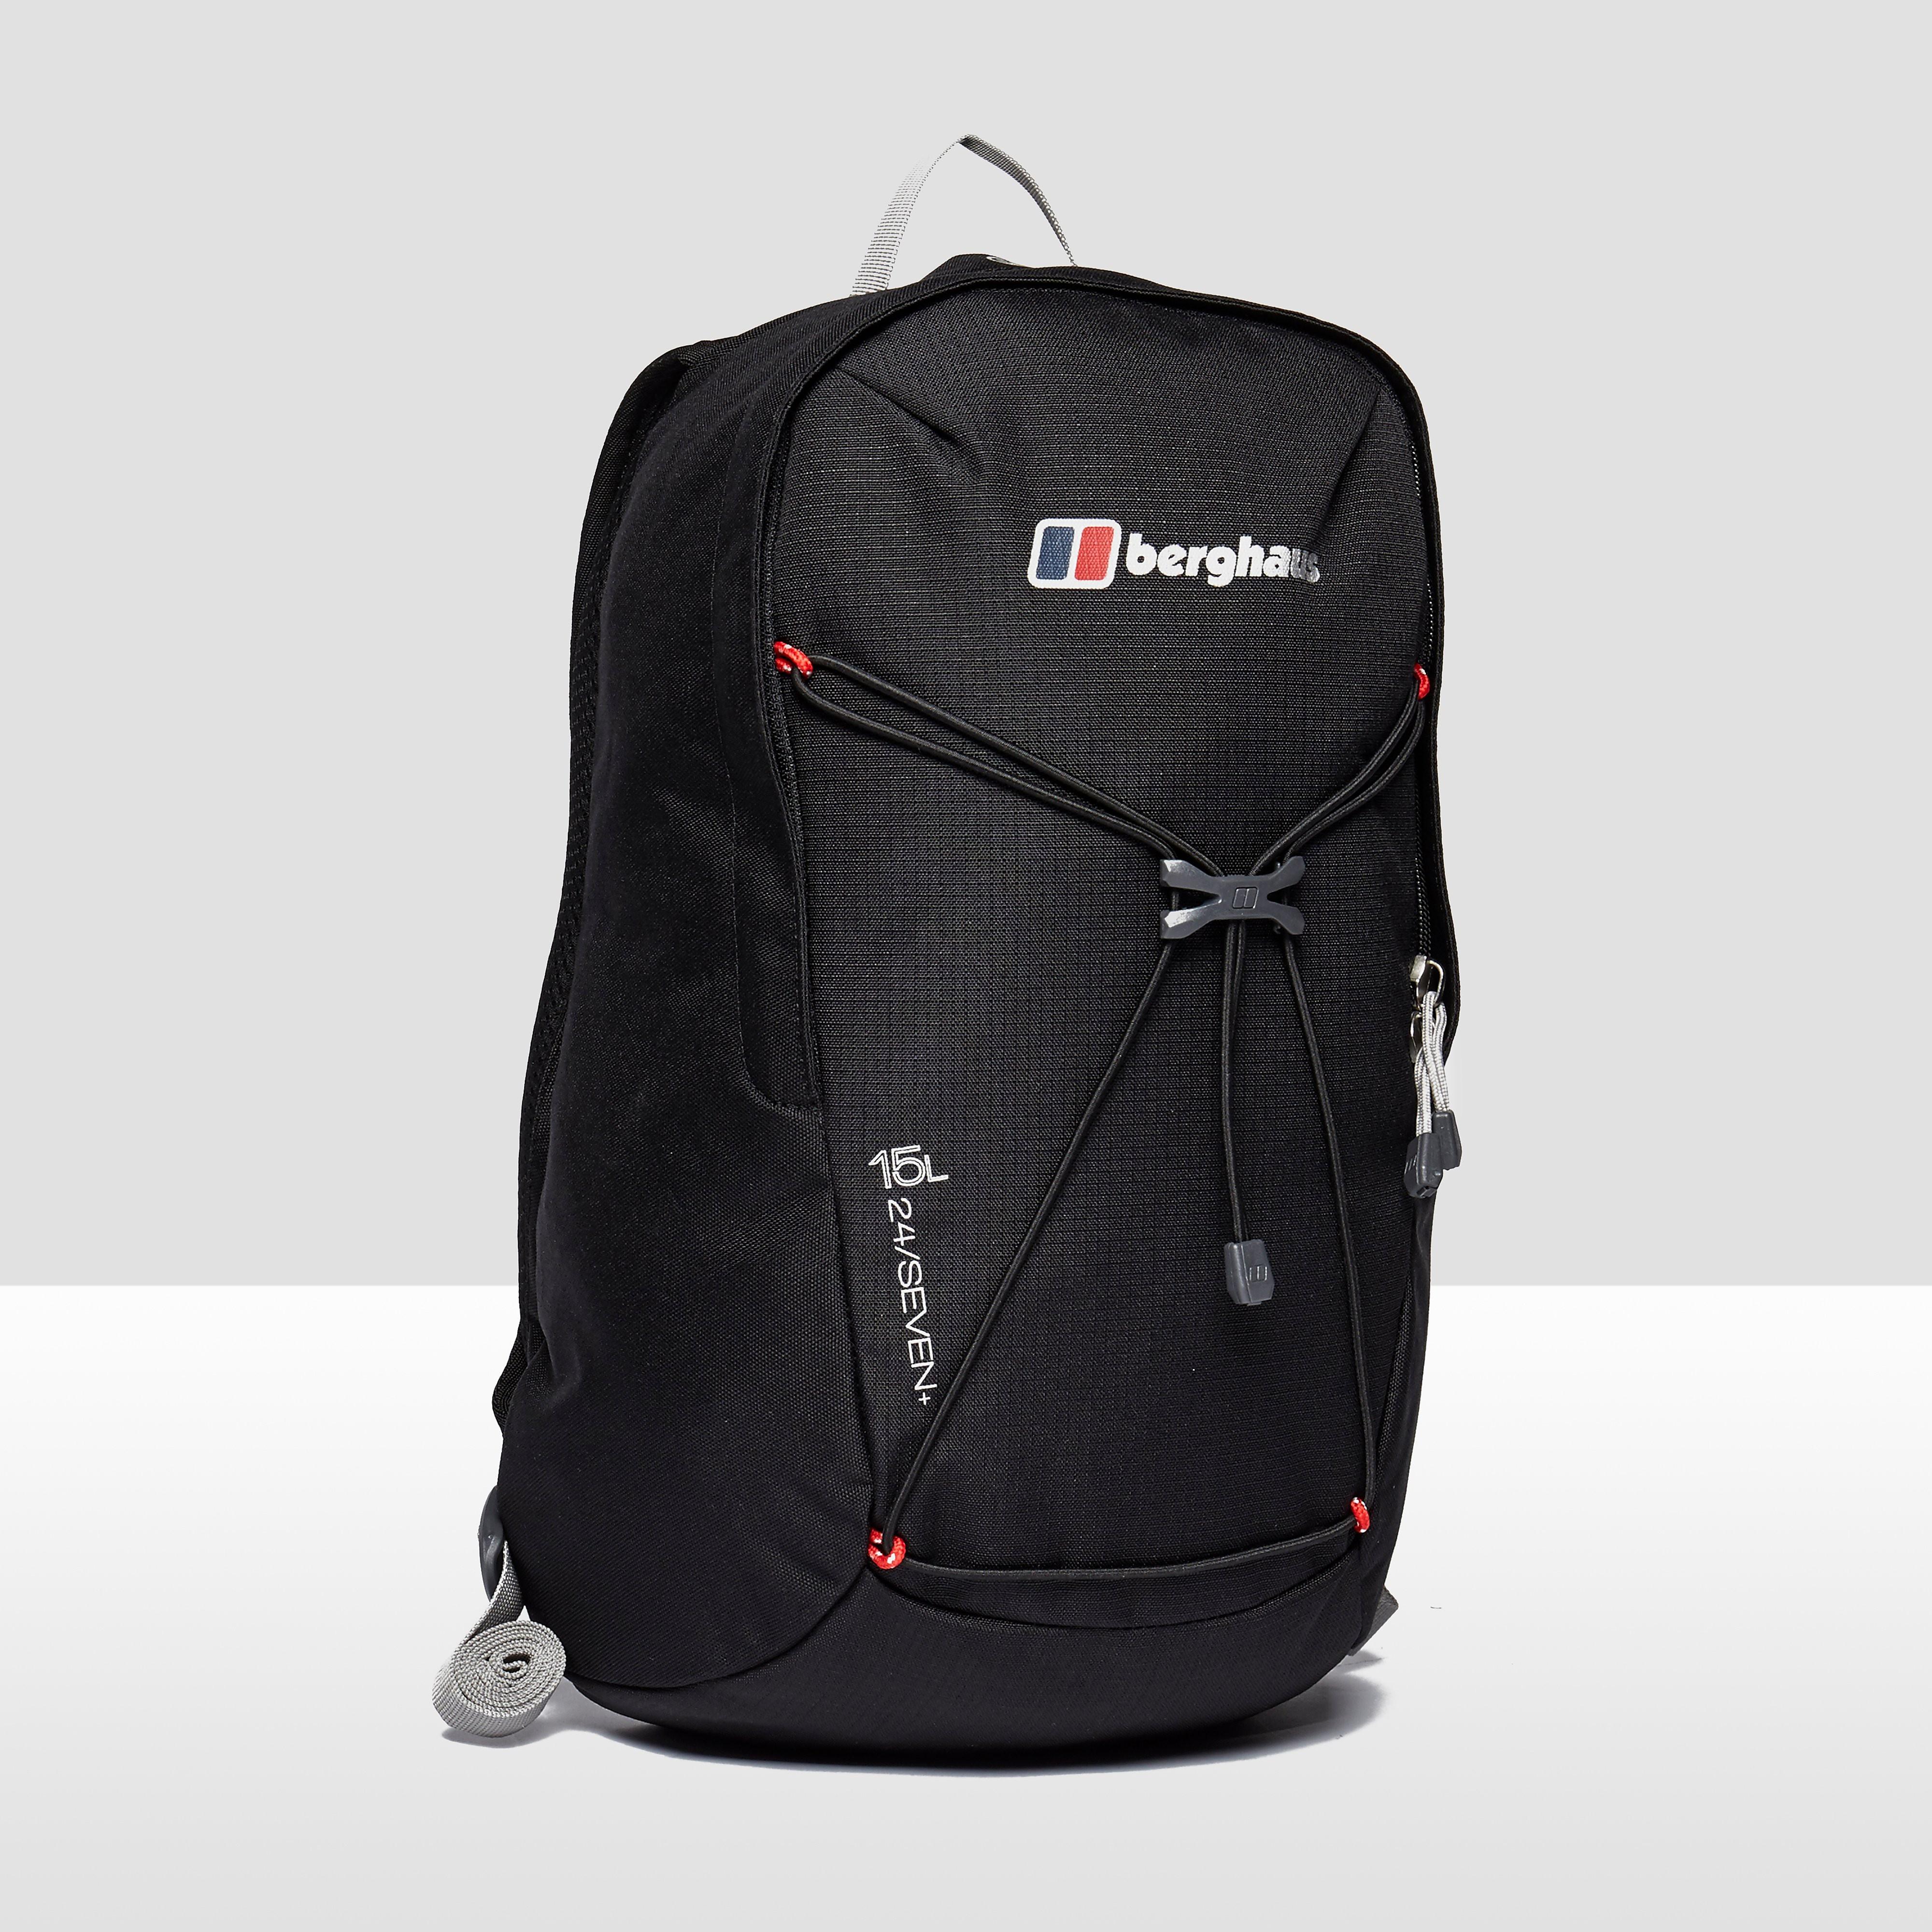 Berghaus Unisex 15L Capacity Backpack